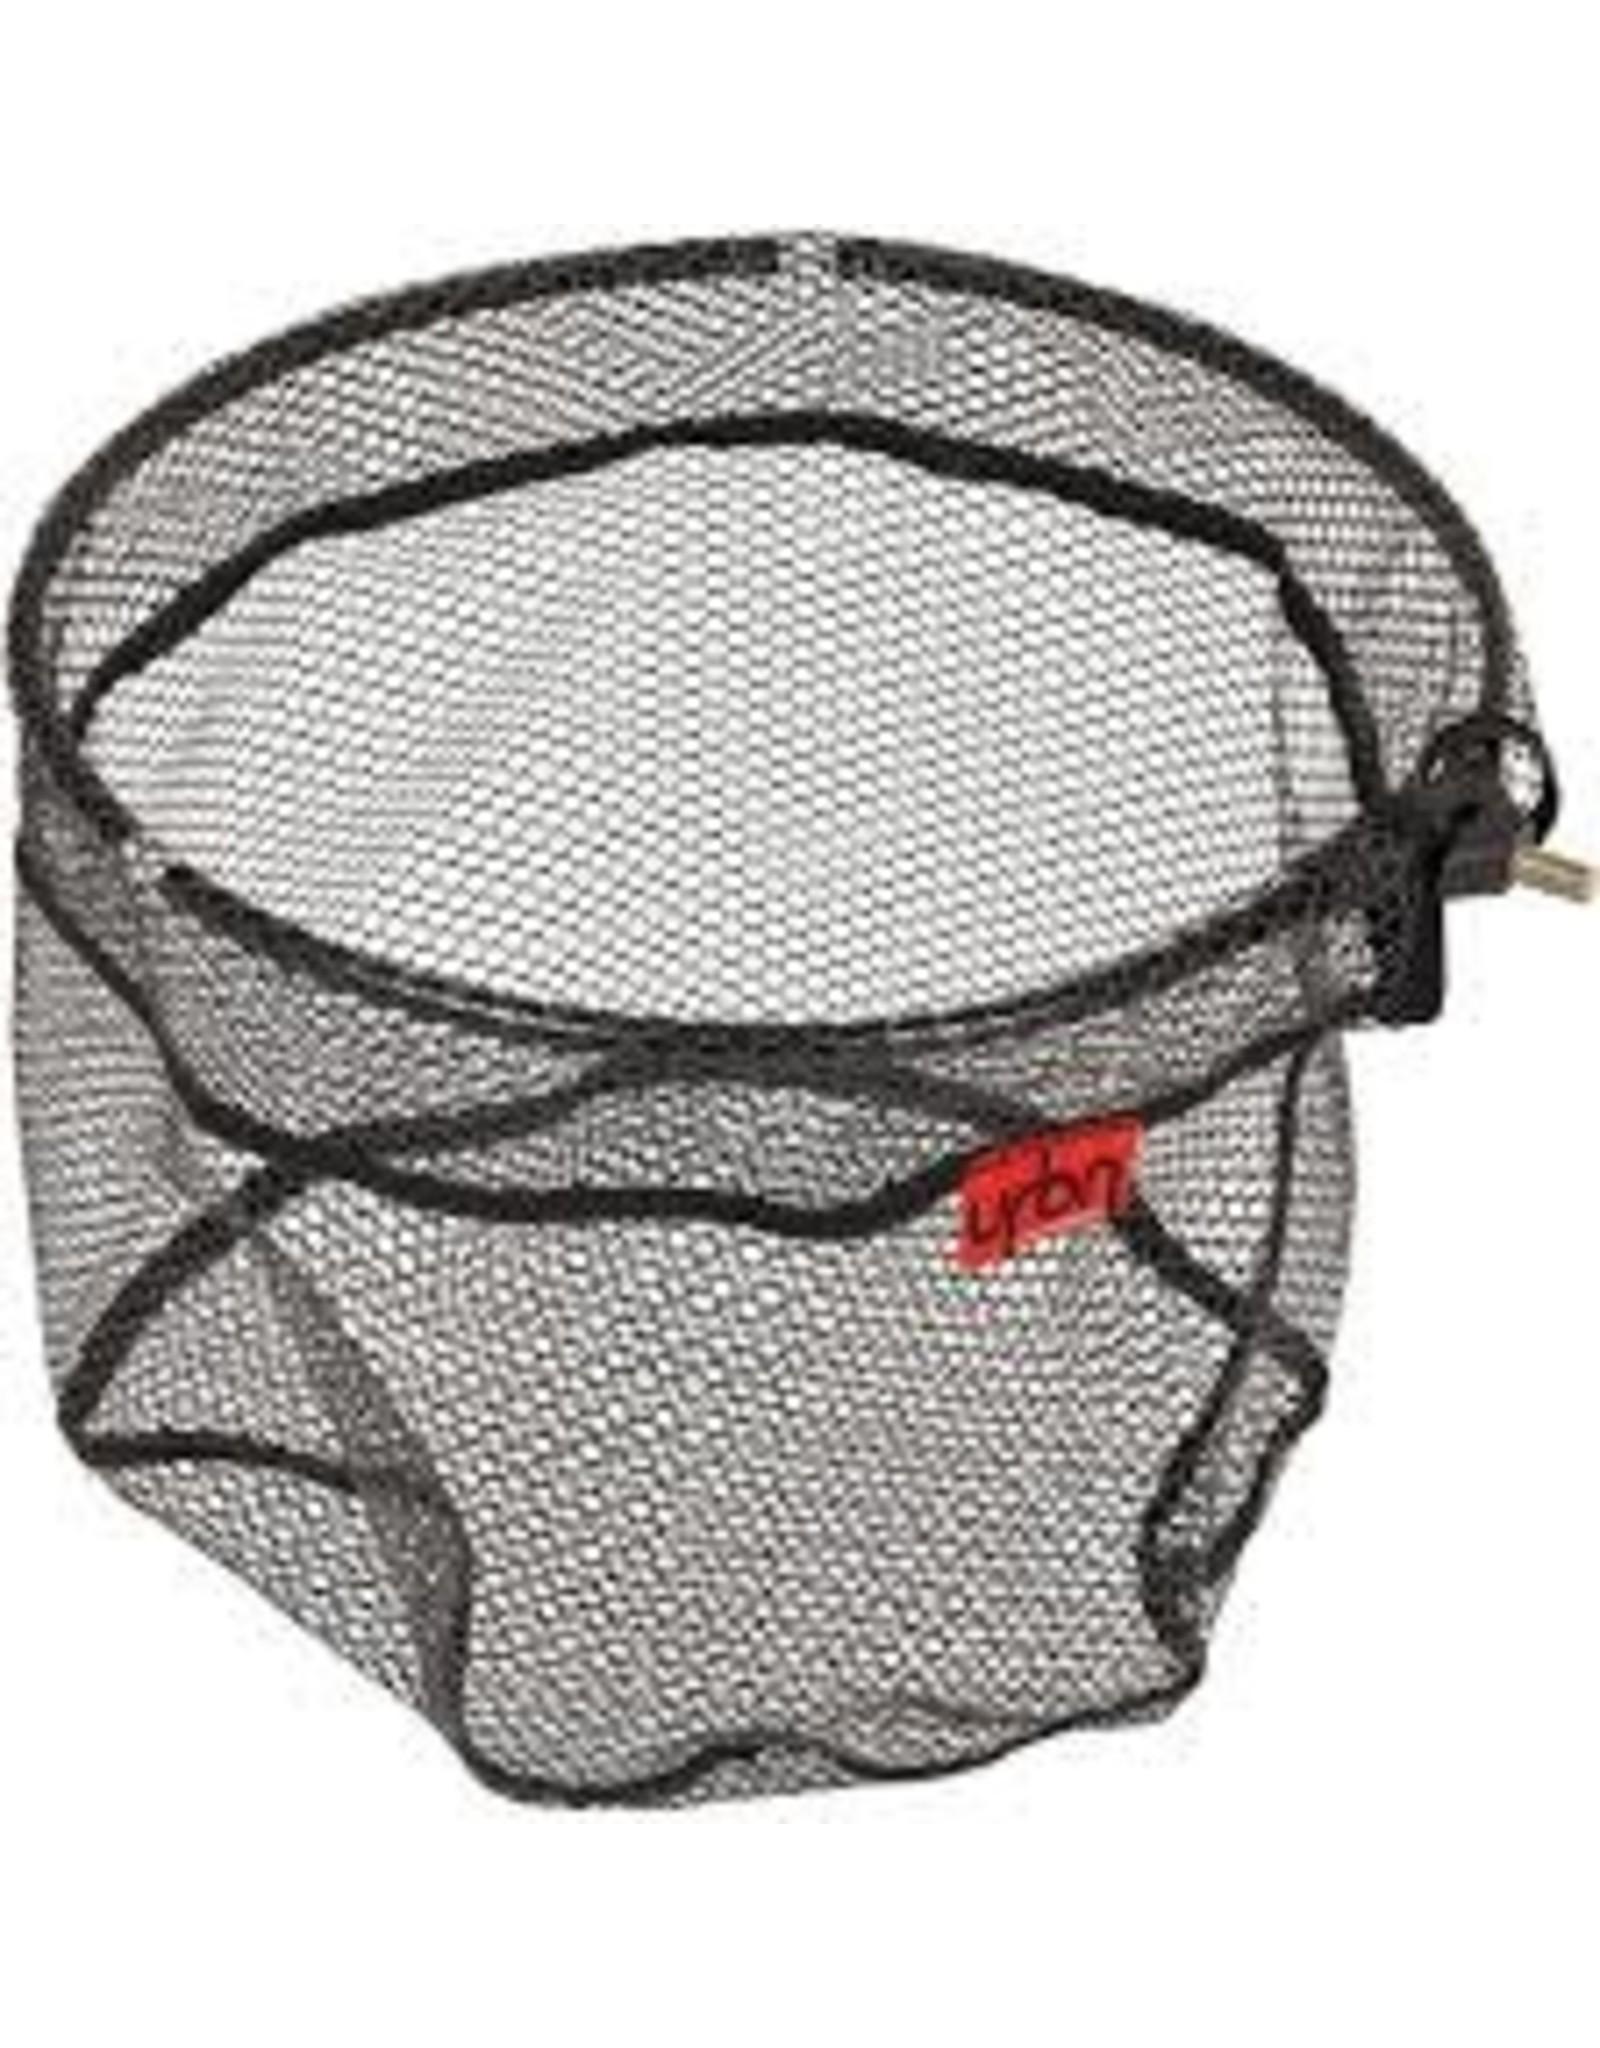 Berkley URBN Stash Net